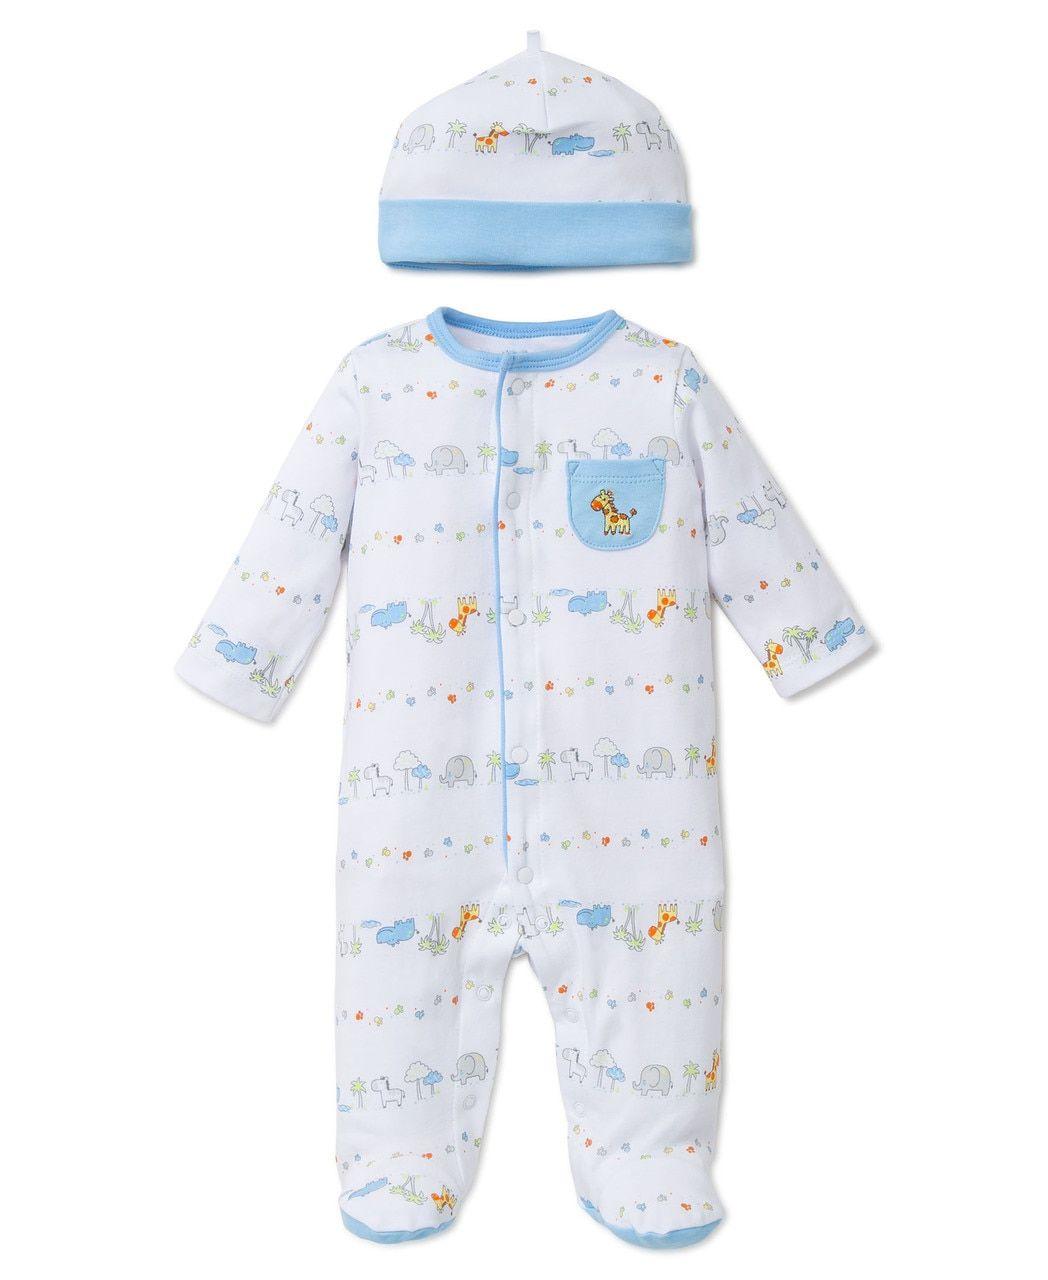 d7a737f15 Fun Safari Footie | A.A.M.G | Newborn boy clothes, Cool baby stuff ...